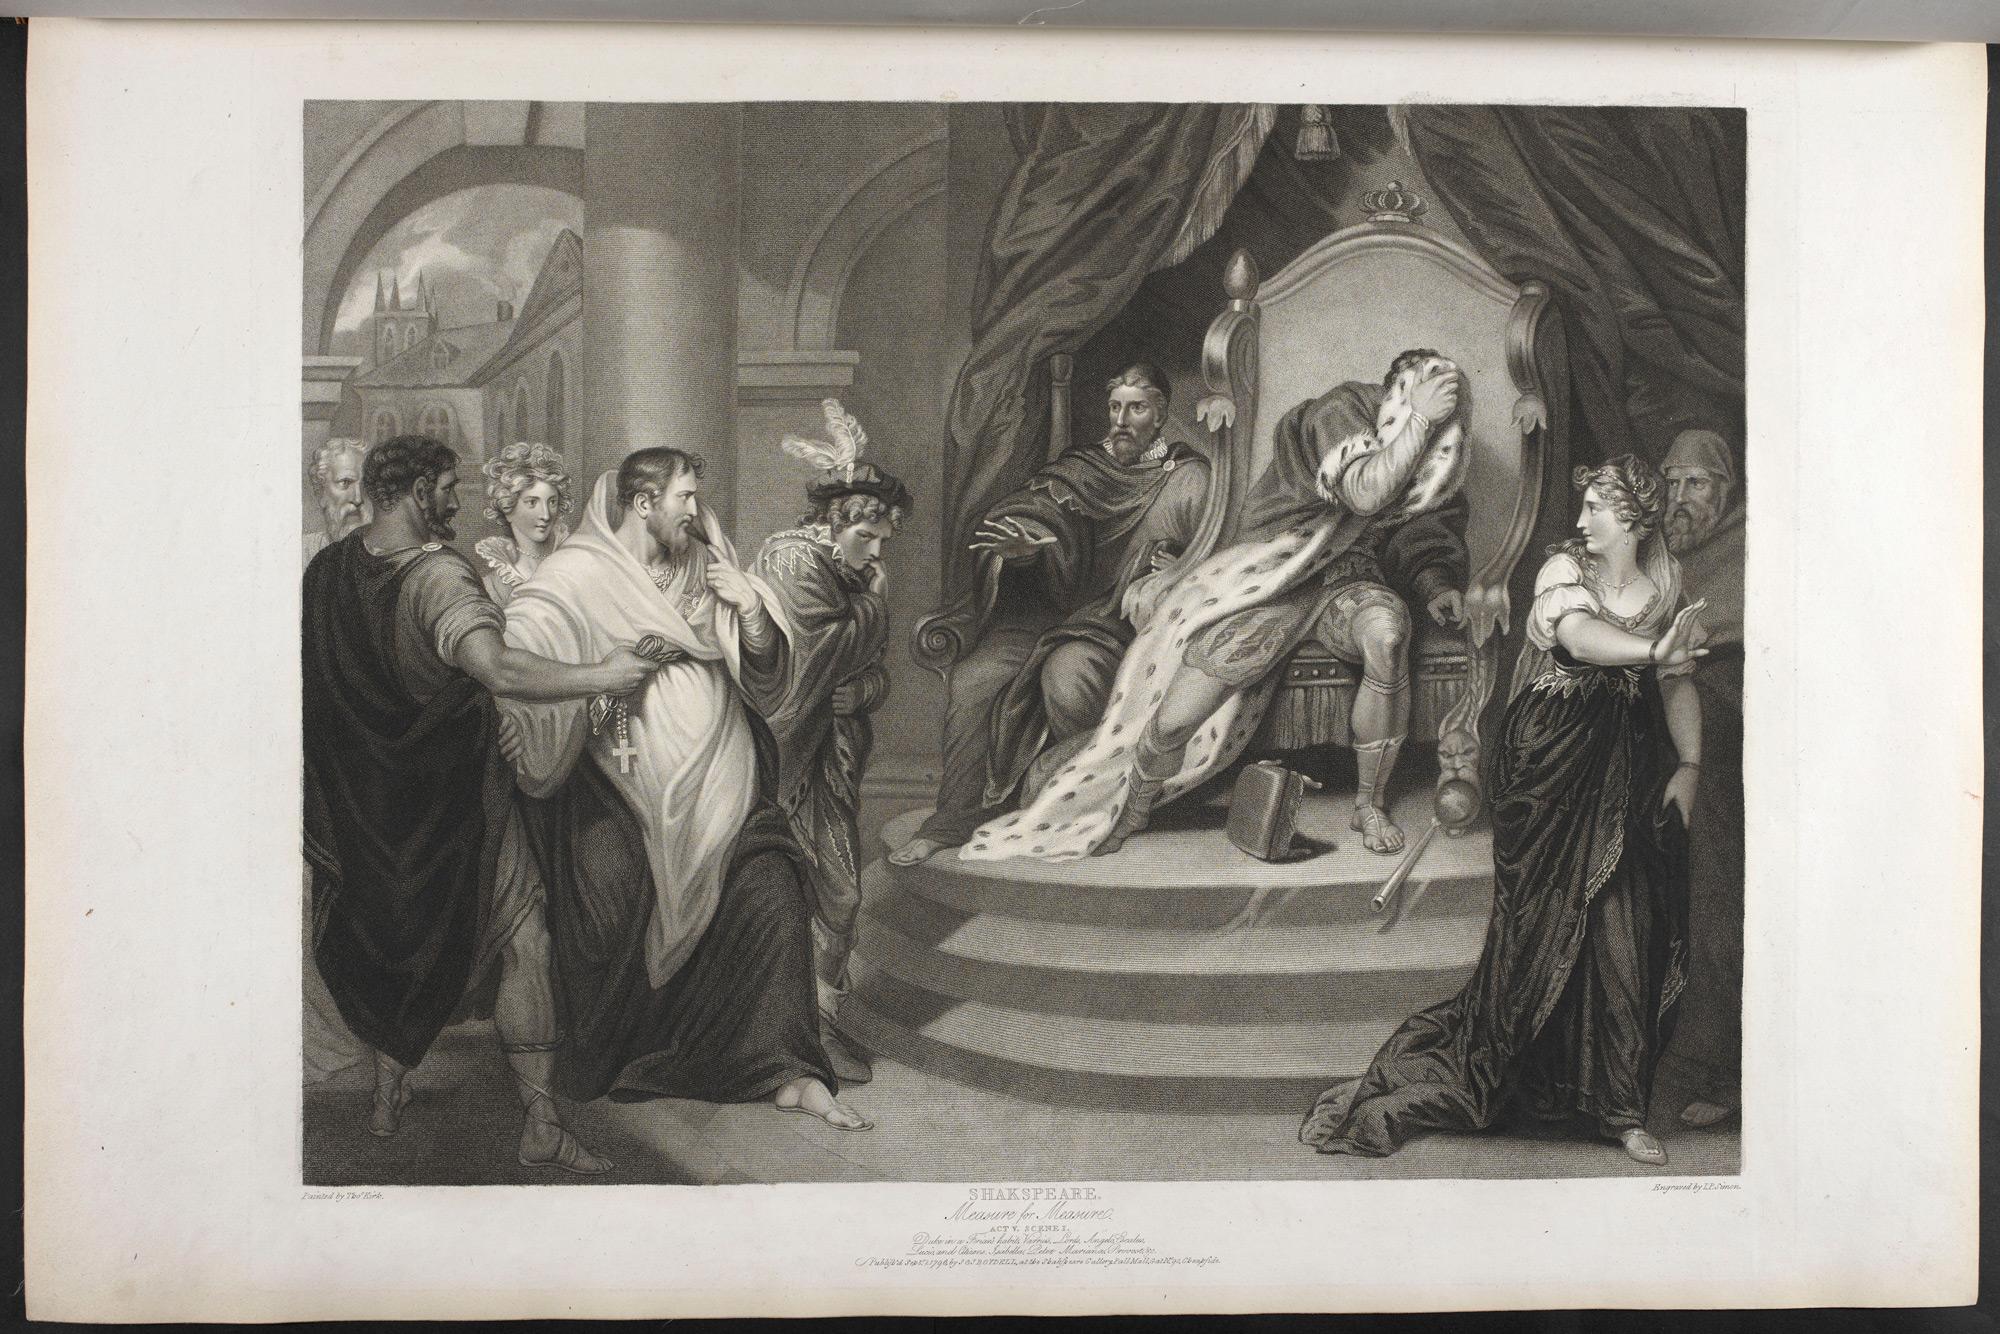 Rhetoric Power And Persuasion In Shakespeare S Julius